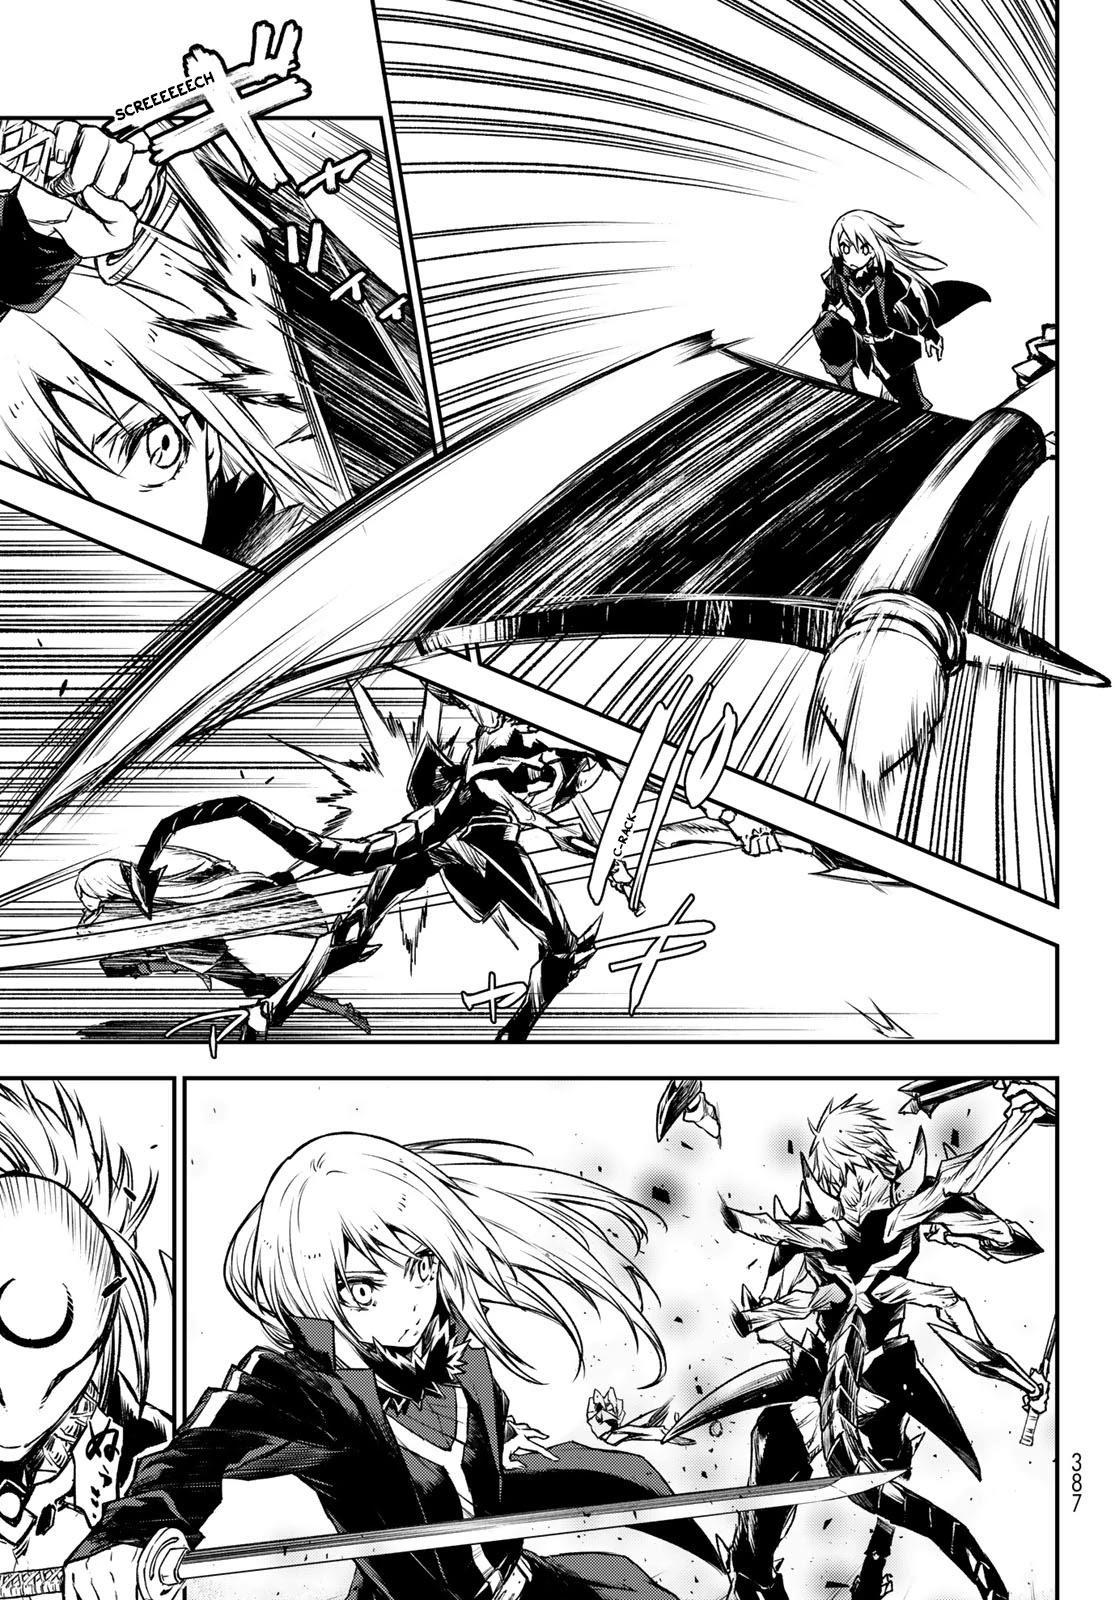 Tensei Shitara Slime Datta Ken Chapter 84 page 3 - Mangakakalots.com